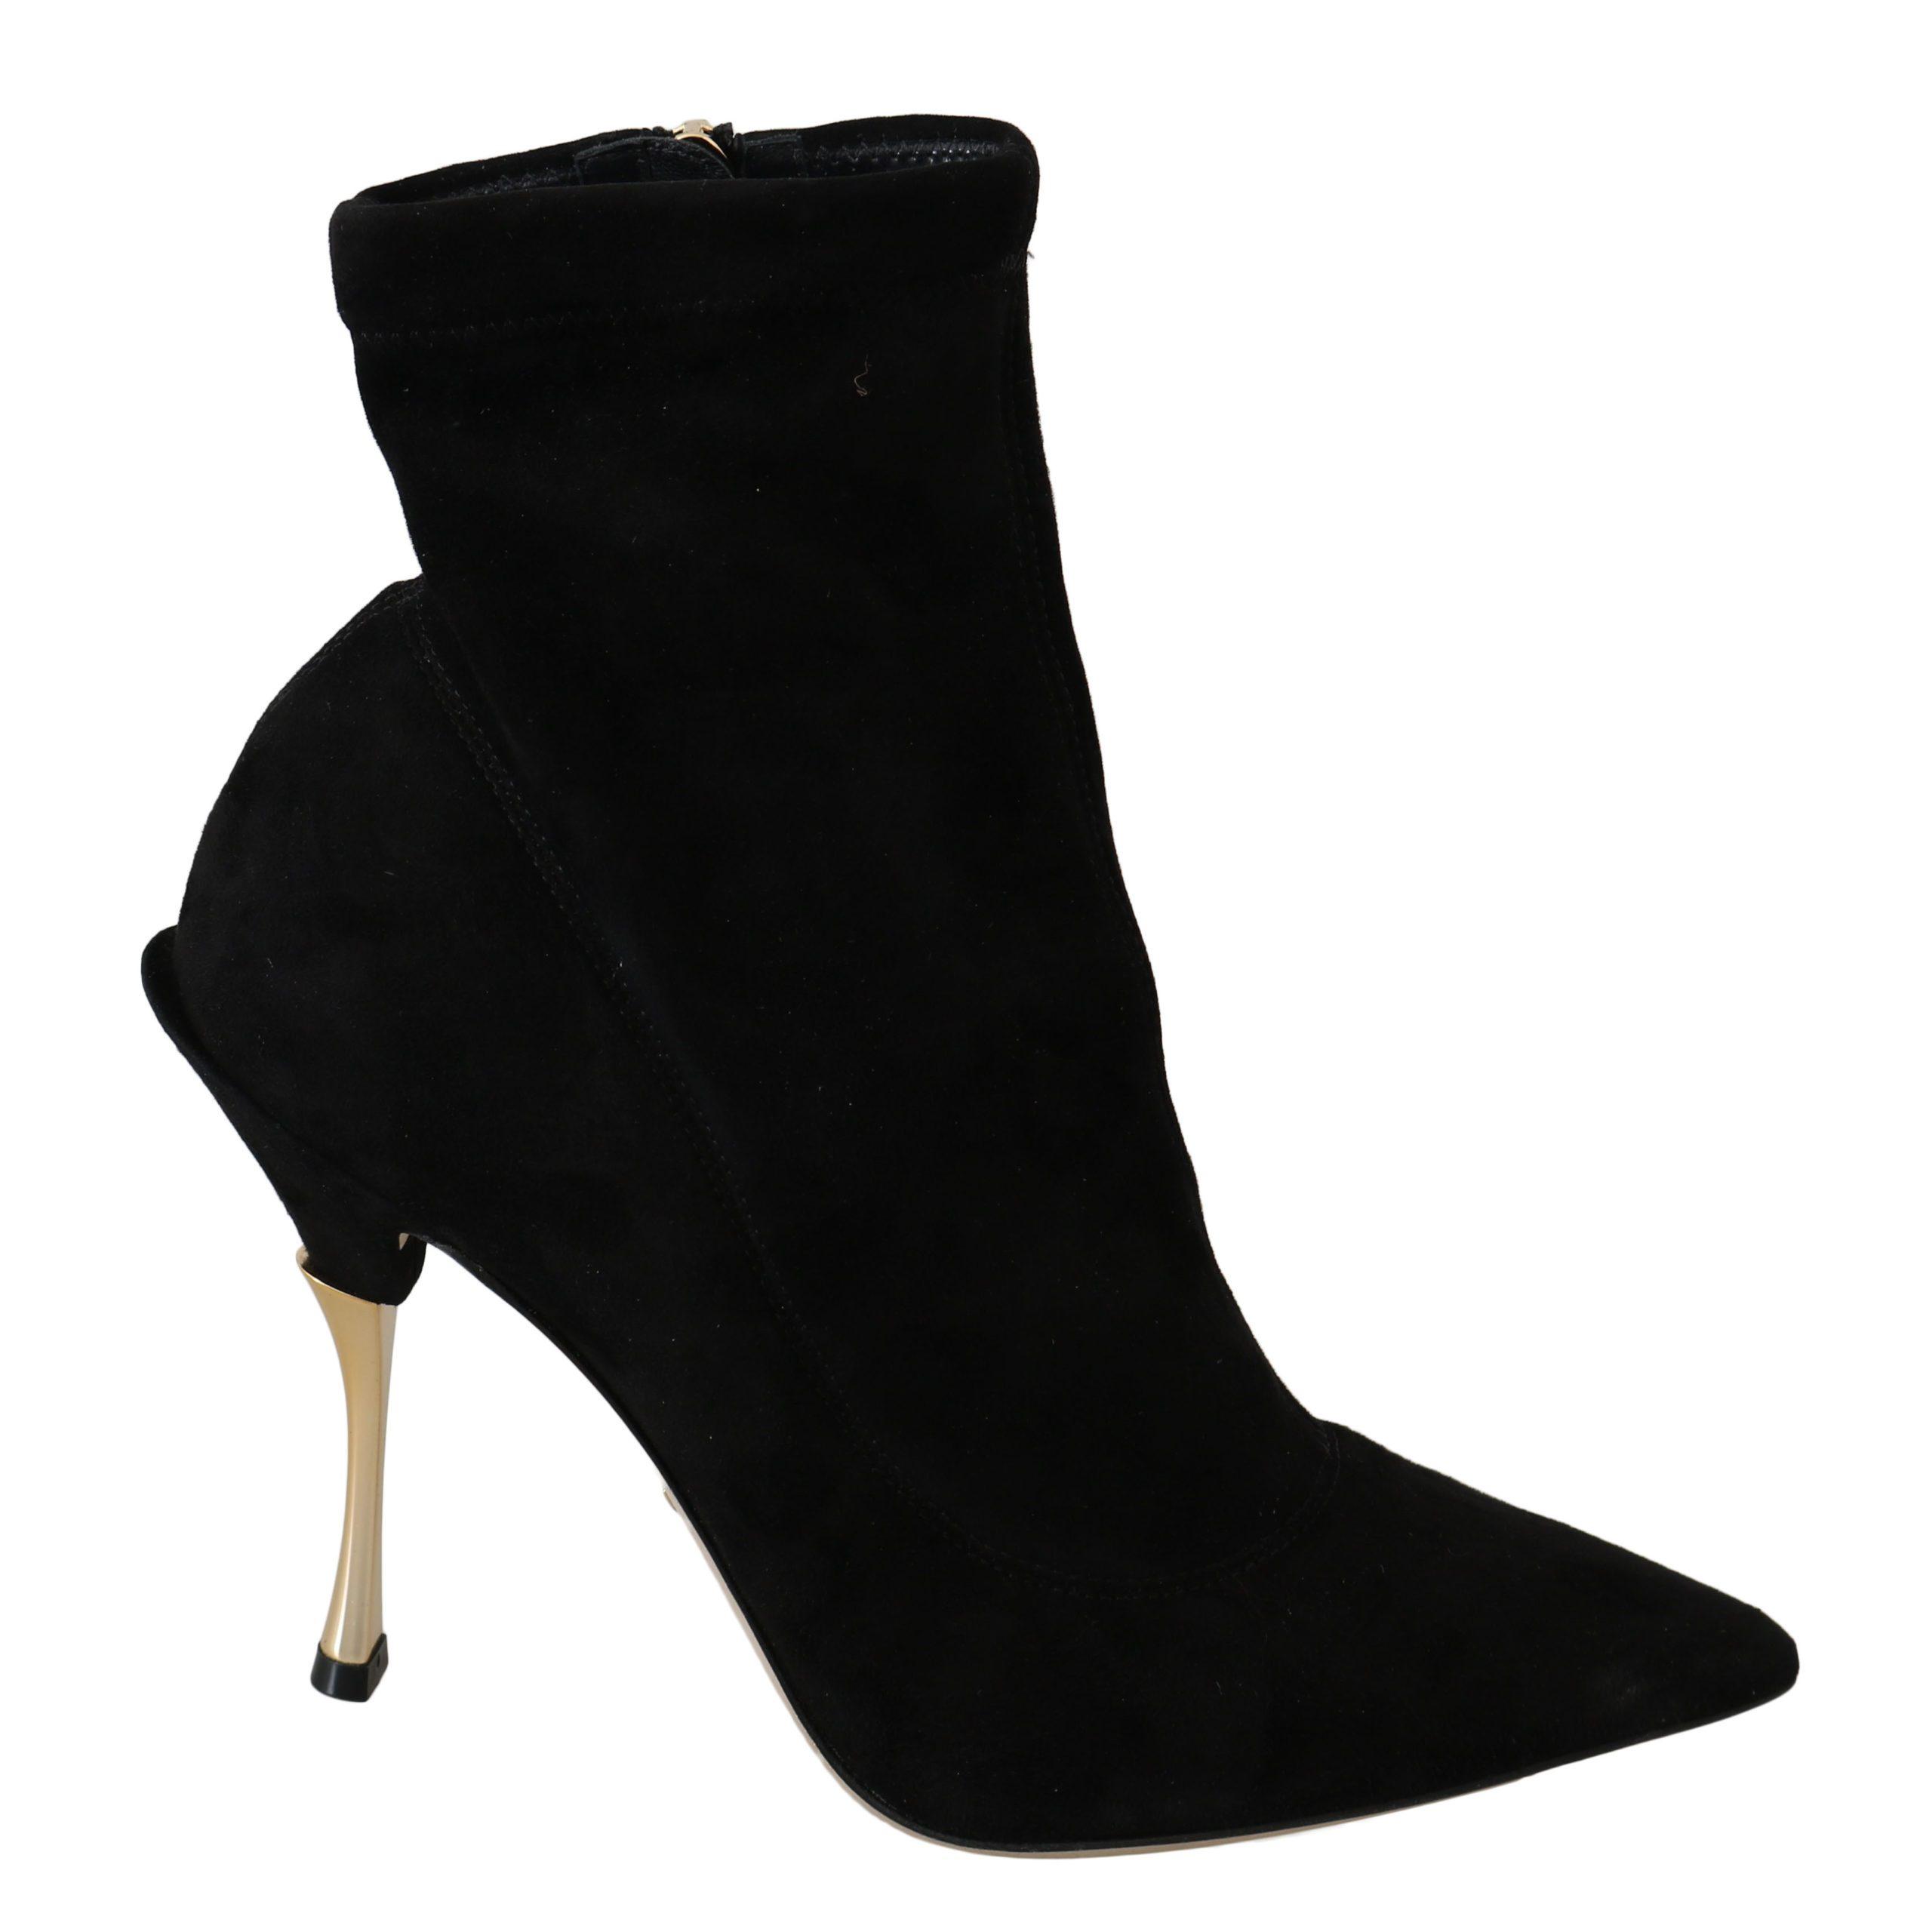 Dolce & Gabbana Women's Suede Ankle Boot Black LA6327 - EU35/US4.5